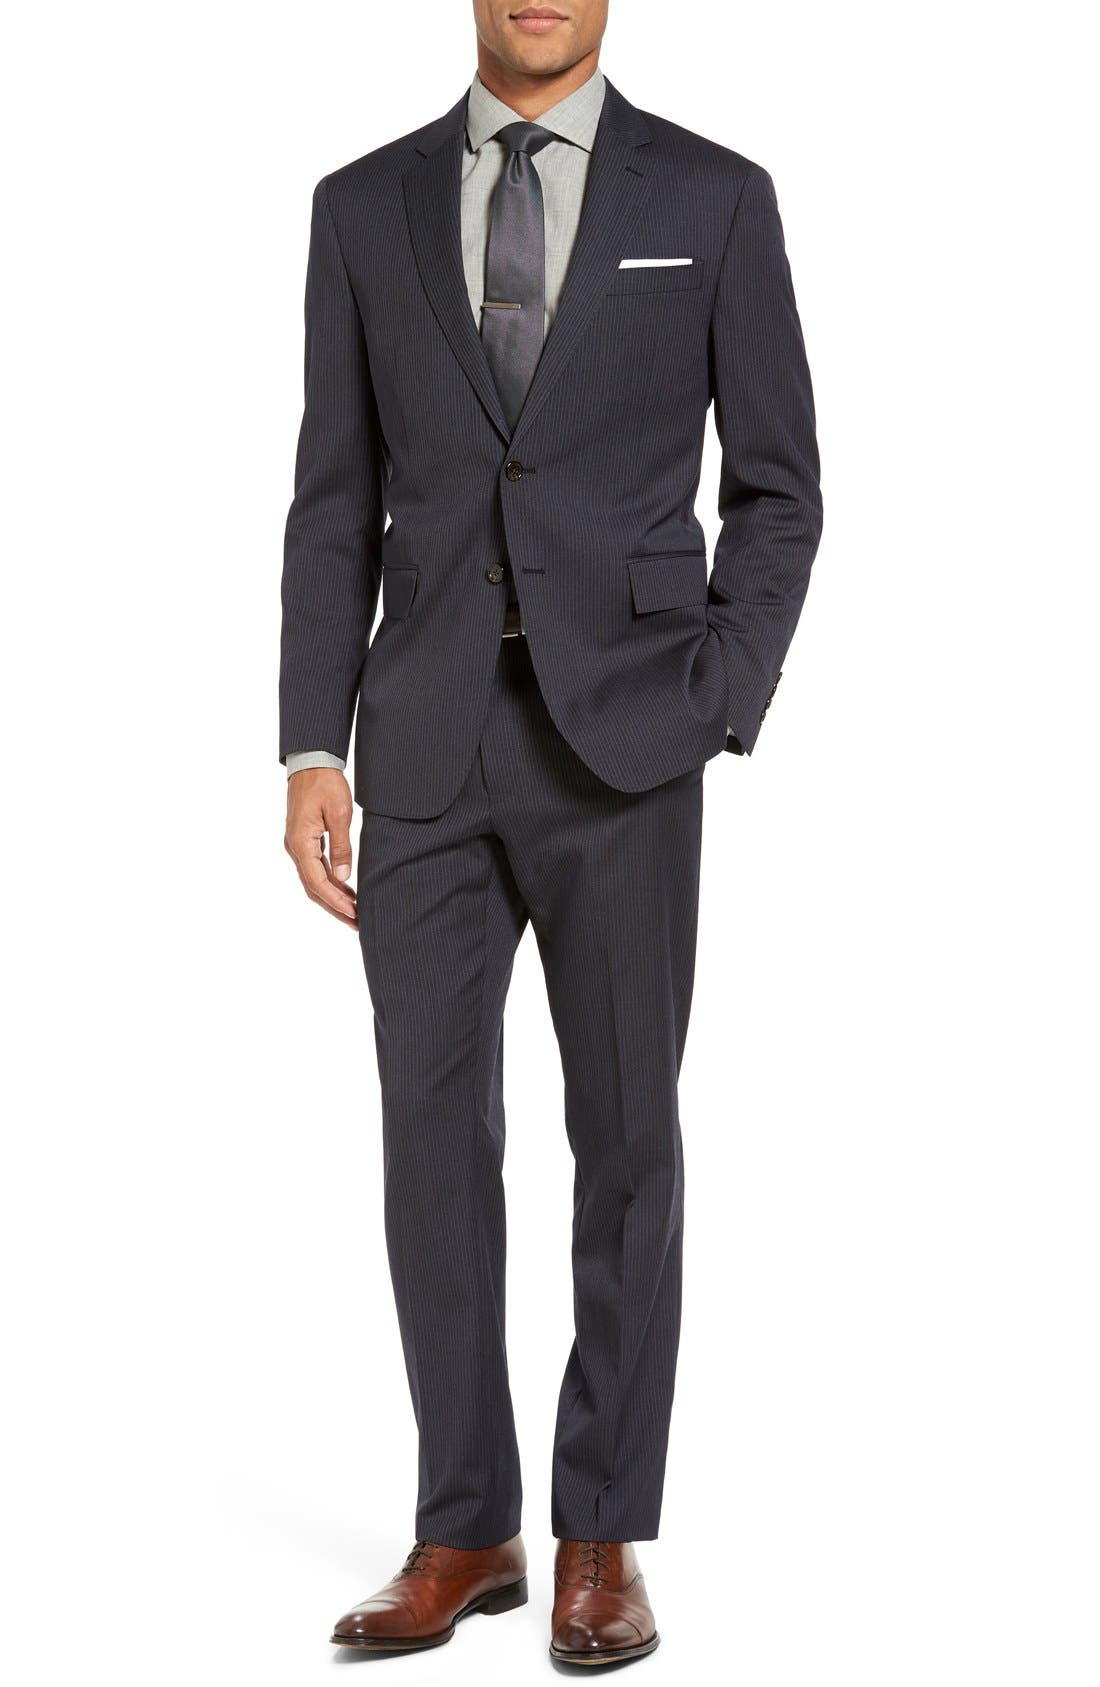 Todd Snyder White Label Trim Fit Stripe Wool Suit